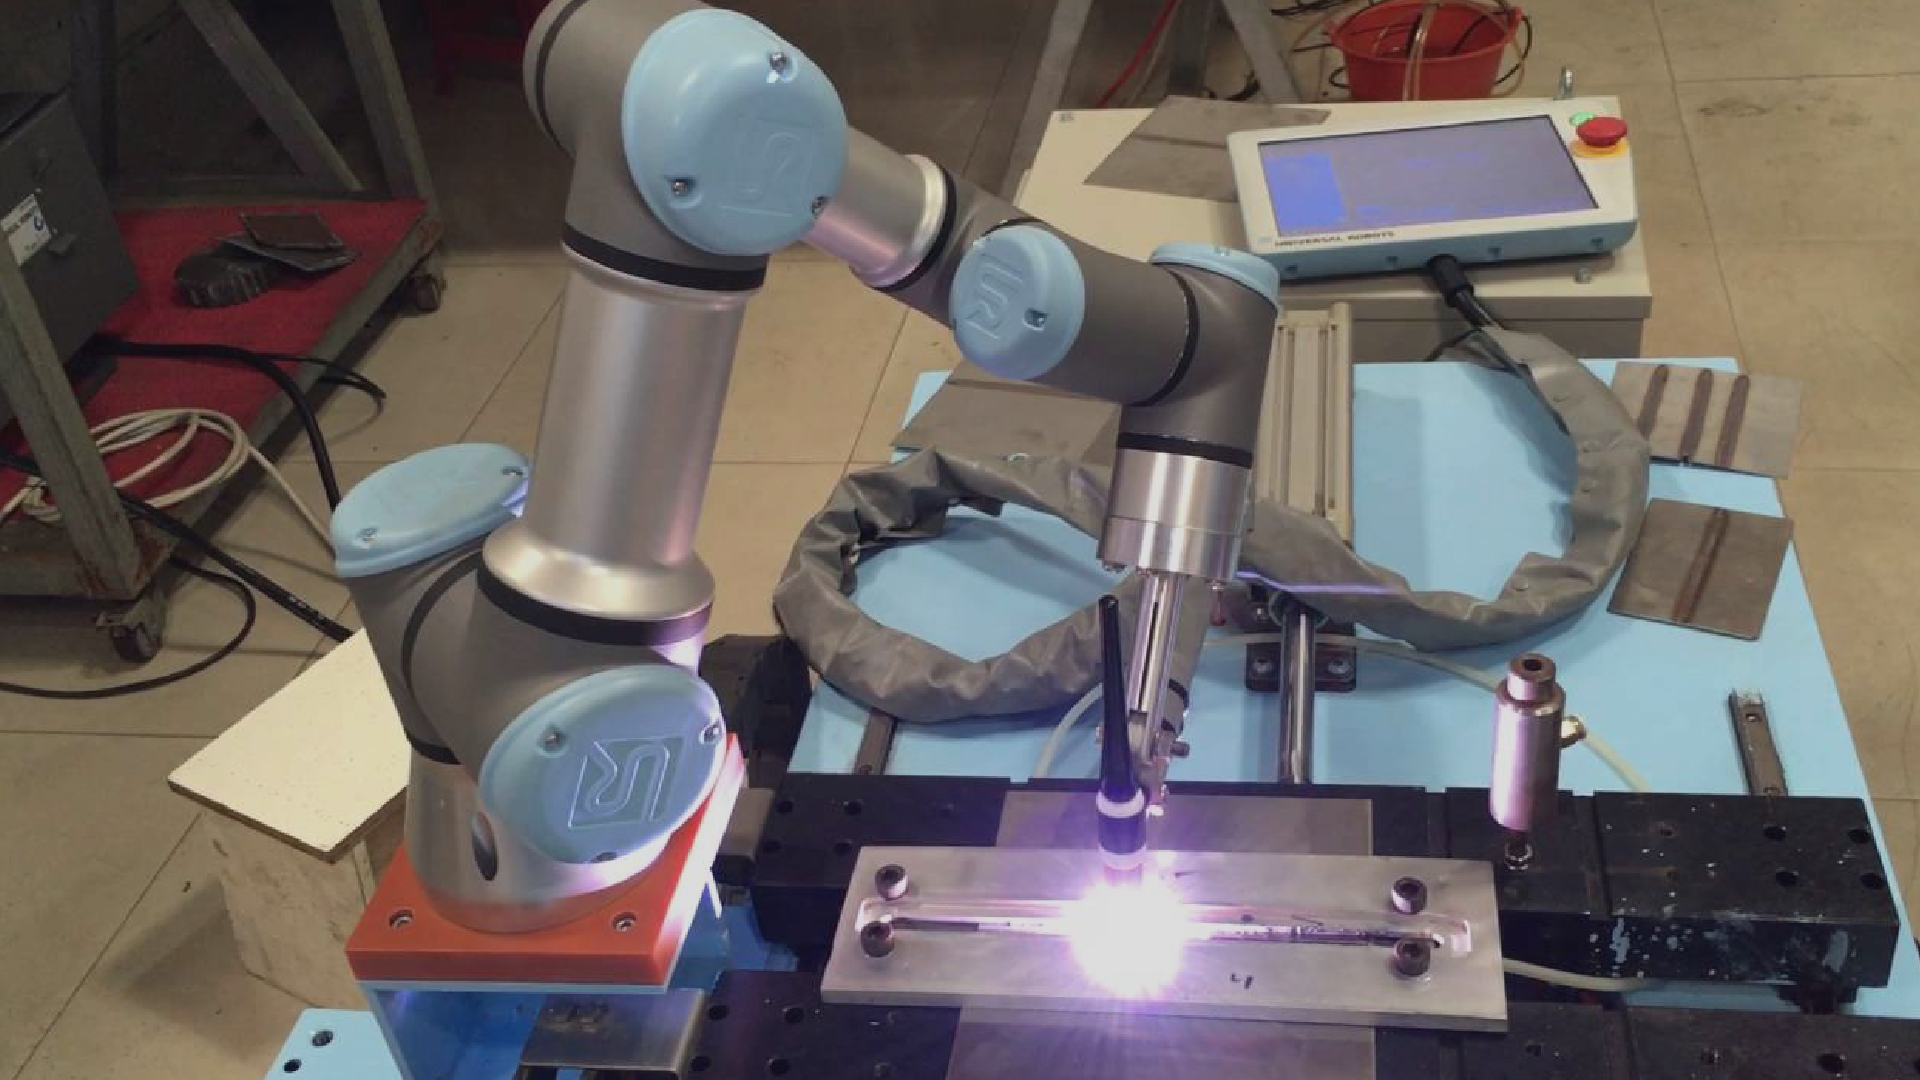 Universal Robots automates welding processes